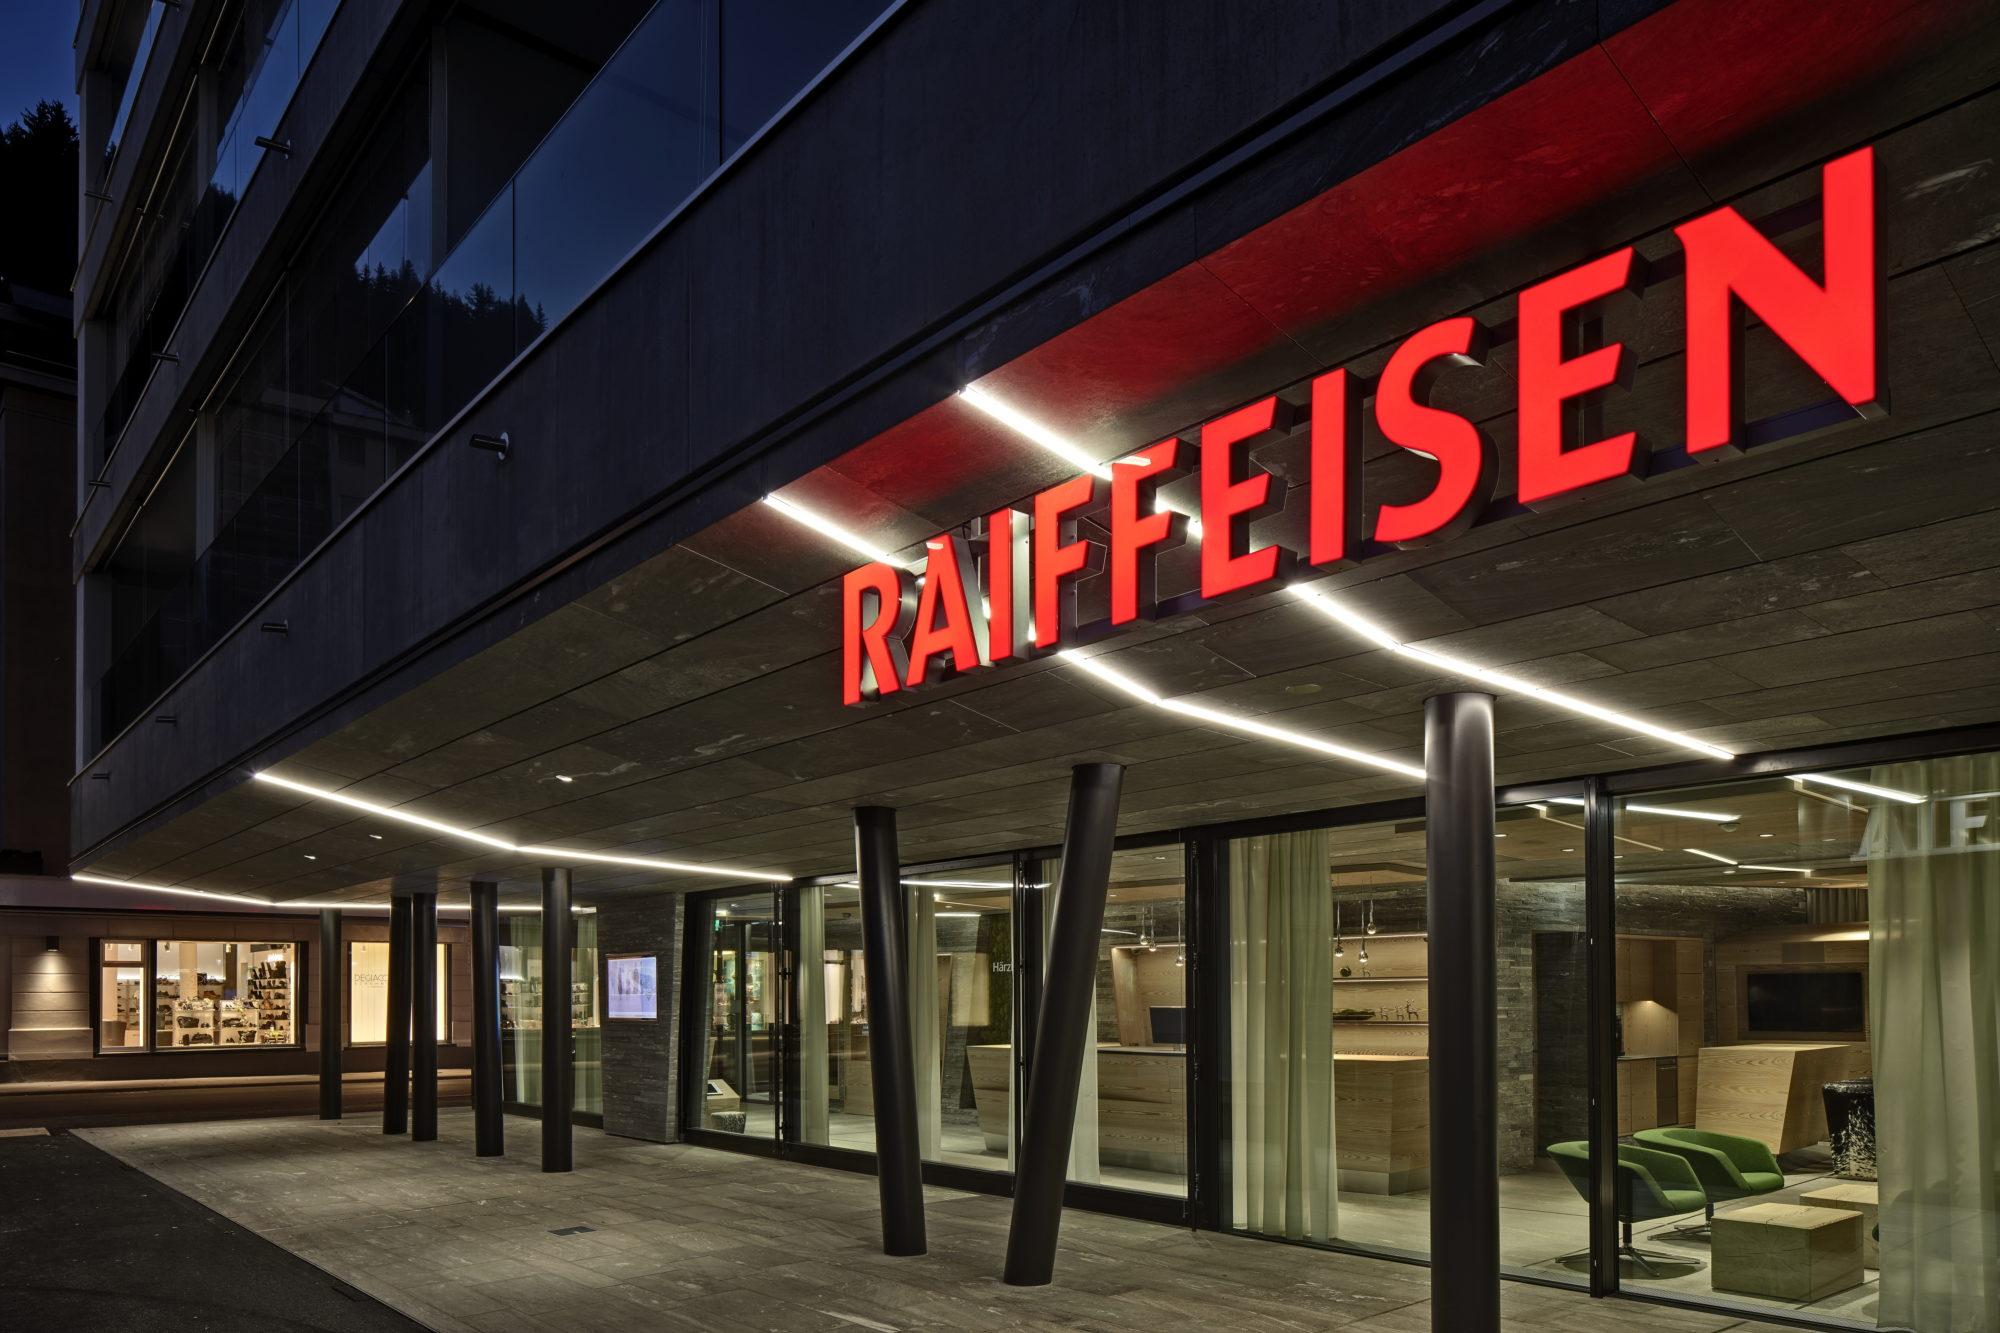 Raiffeisen_by R Dürr_40